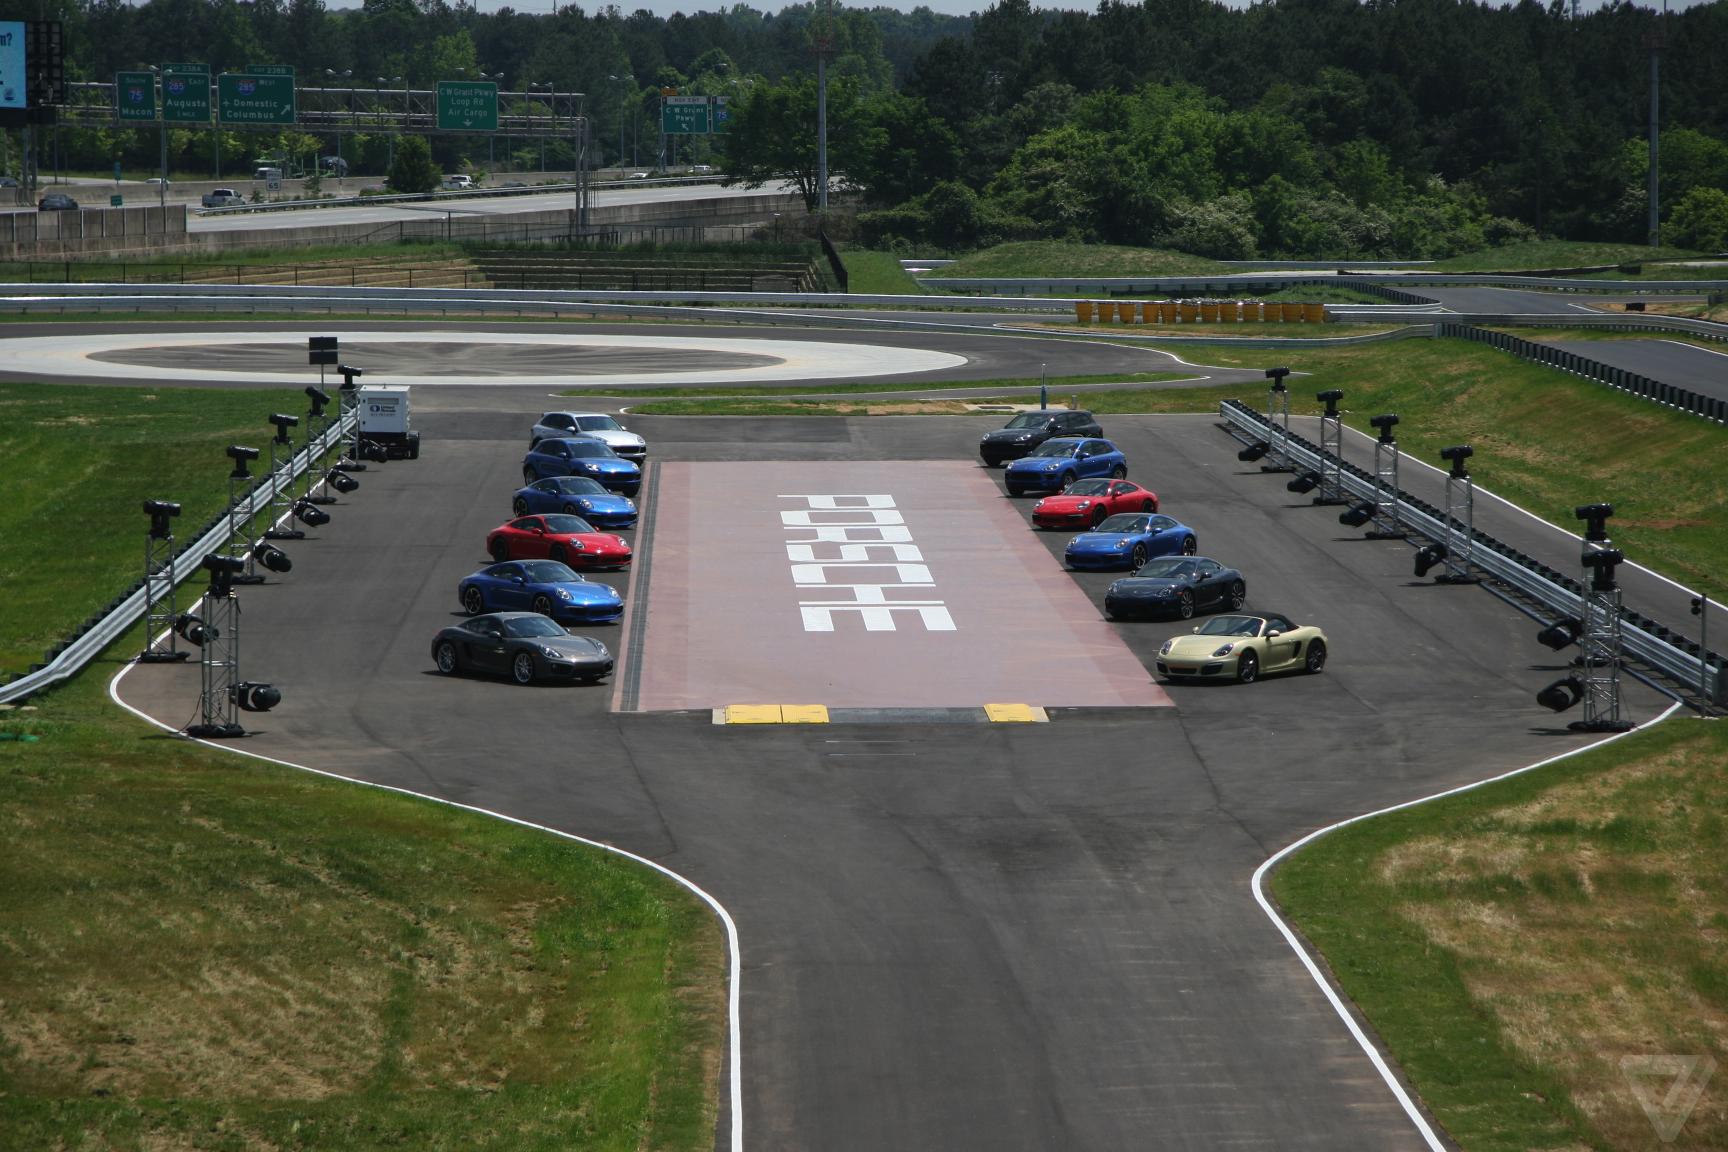 Porsche Experience Center >> The 100 Million Playground Inside Porsche S New Experience Center